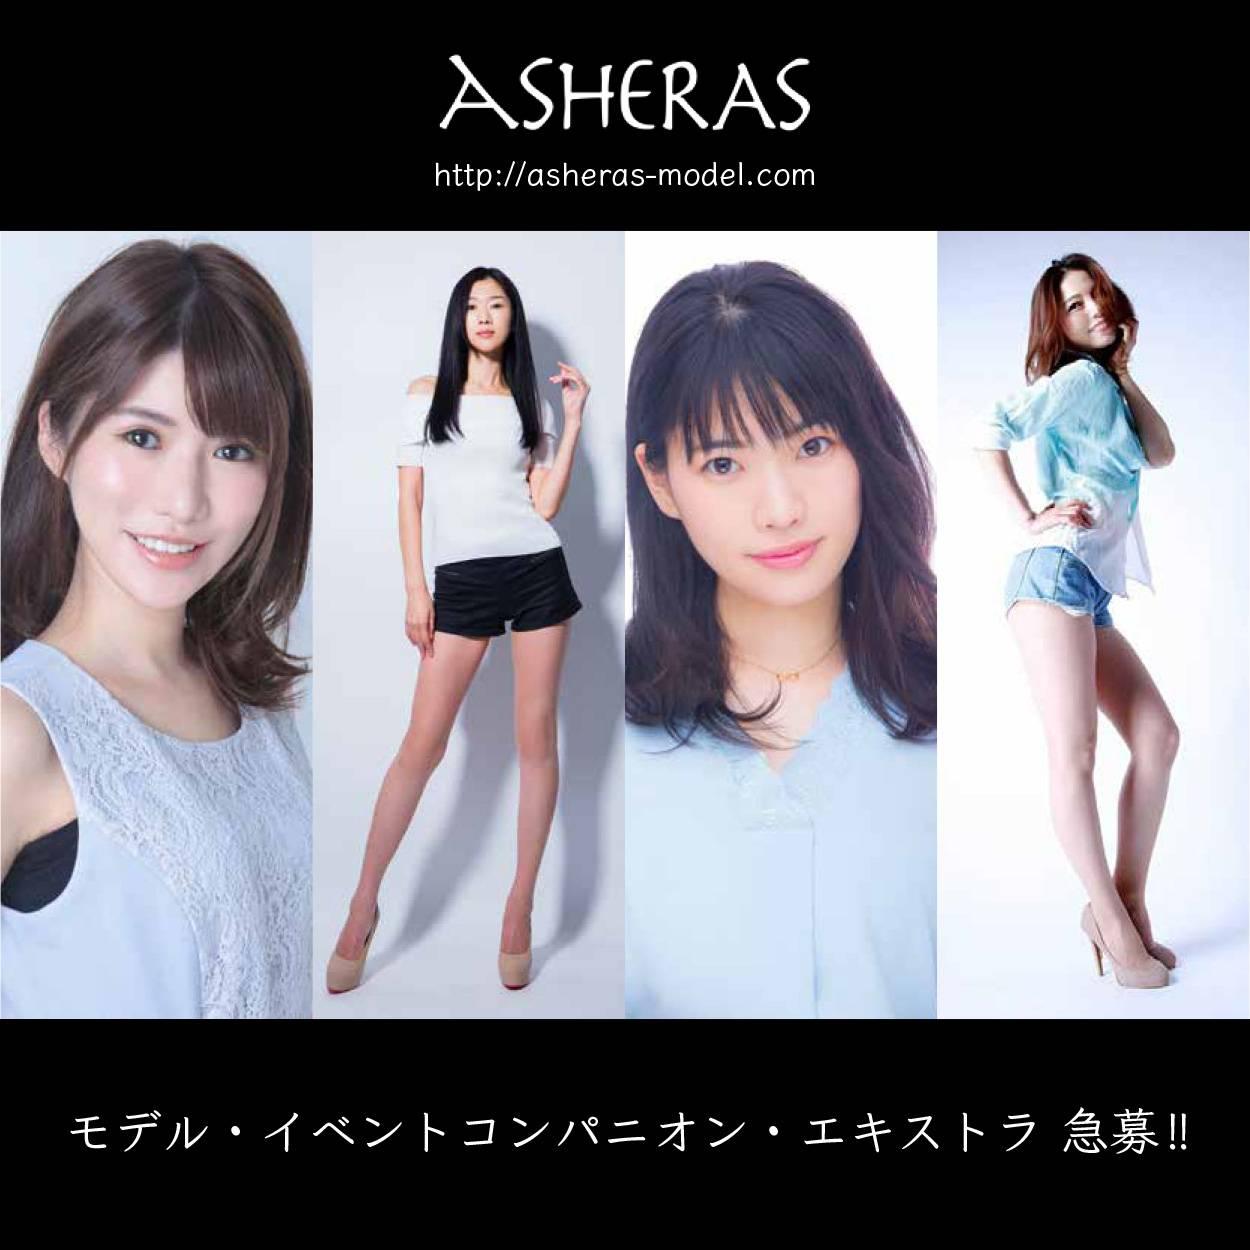 Asheras合同会社